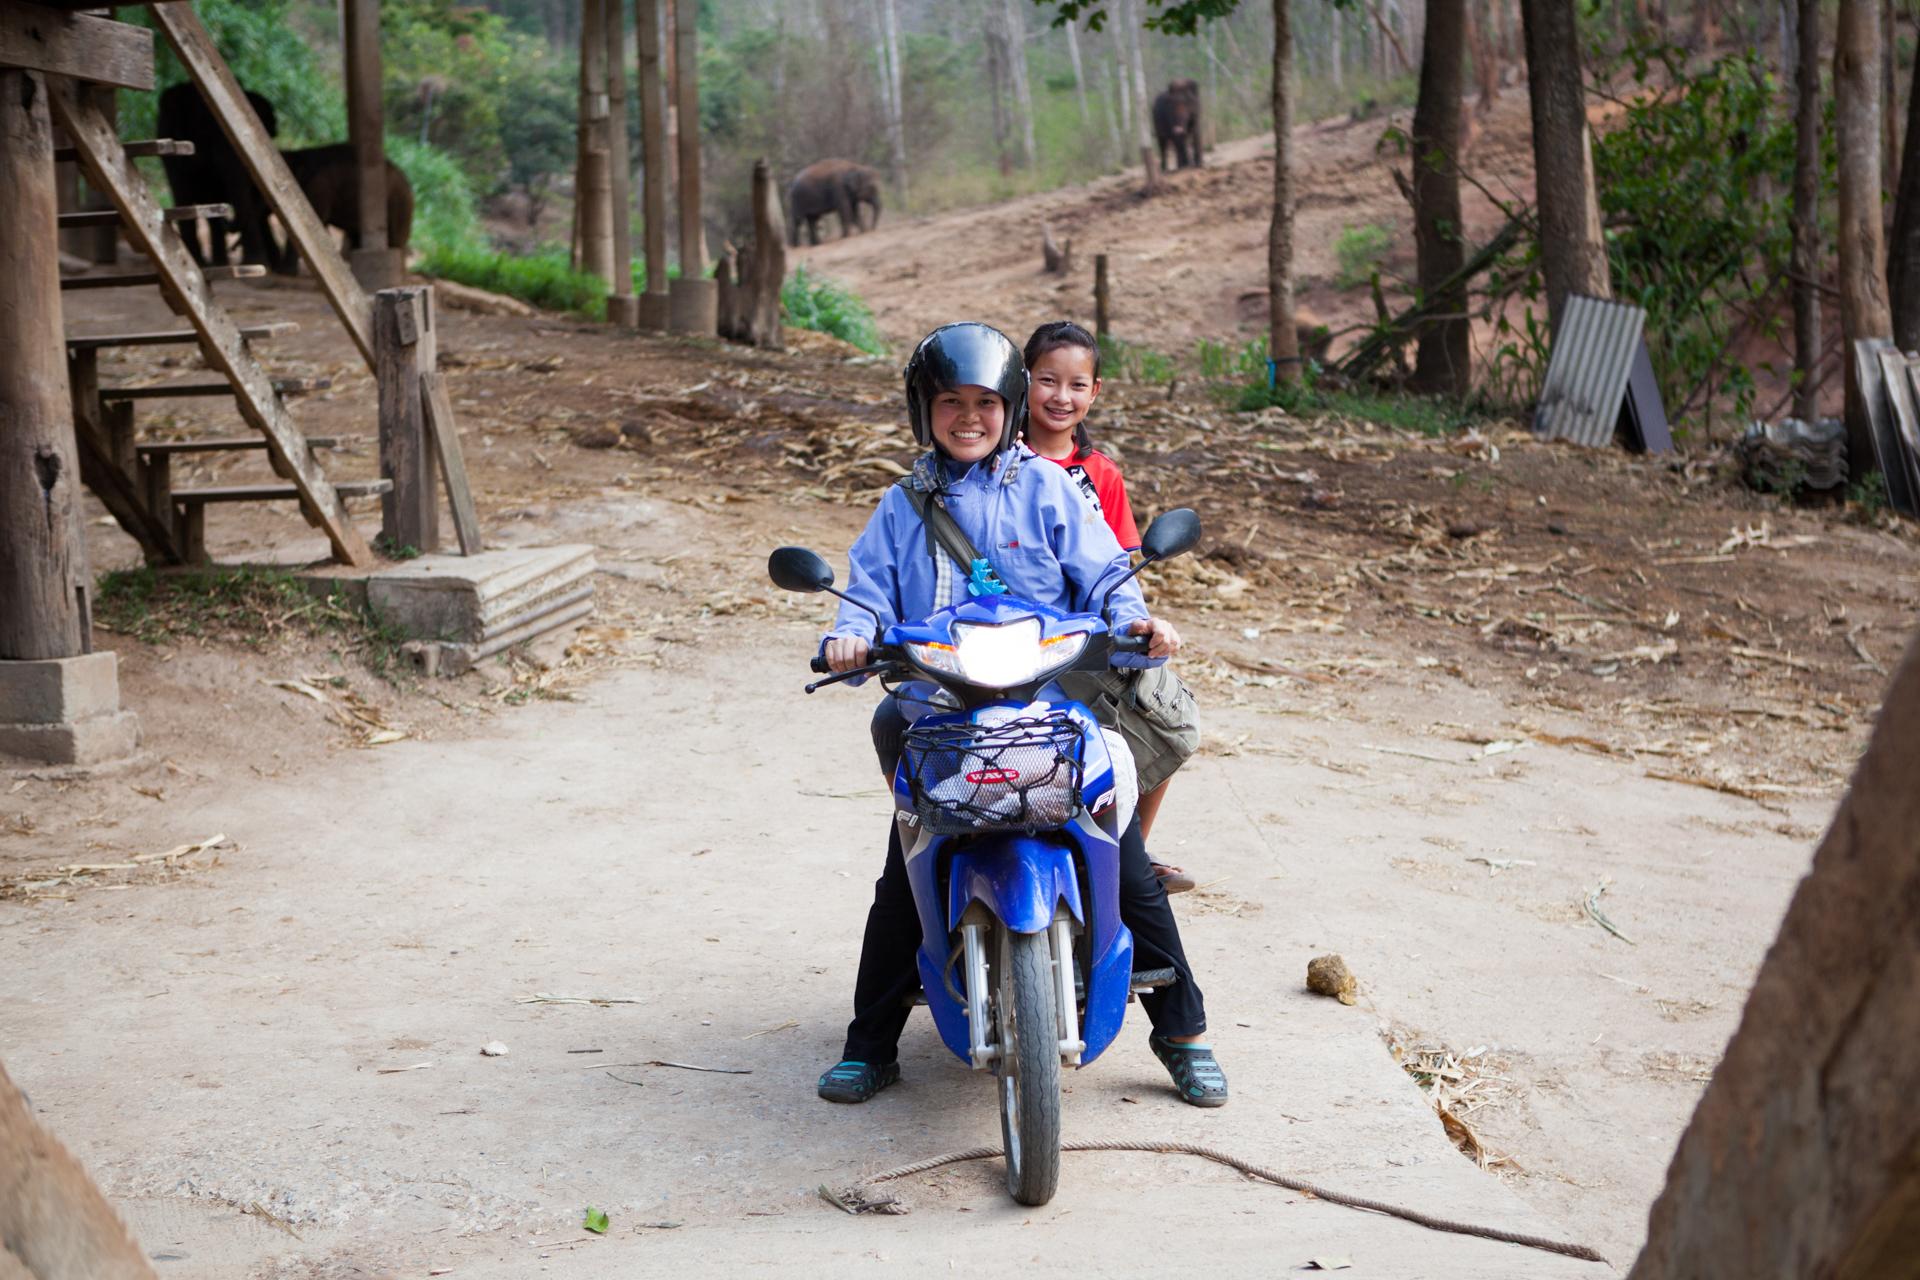 19_Bow_Motorbike.jpg